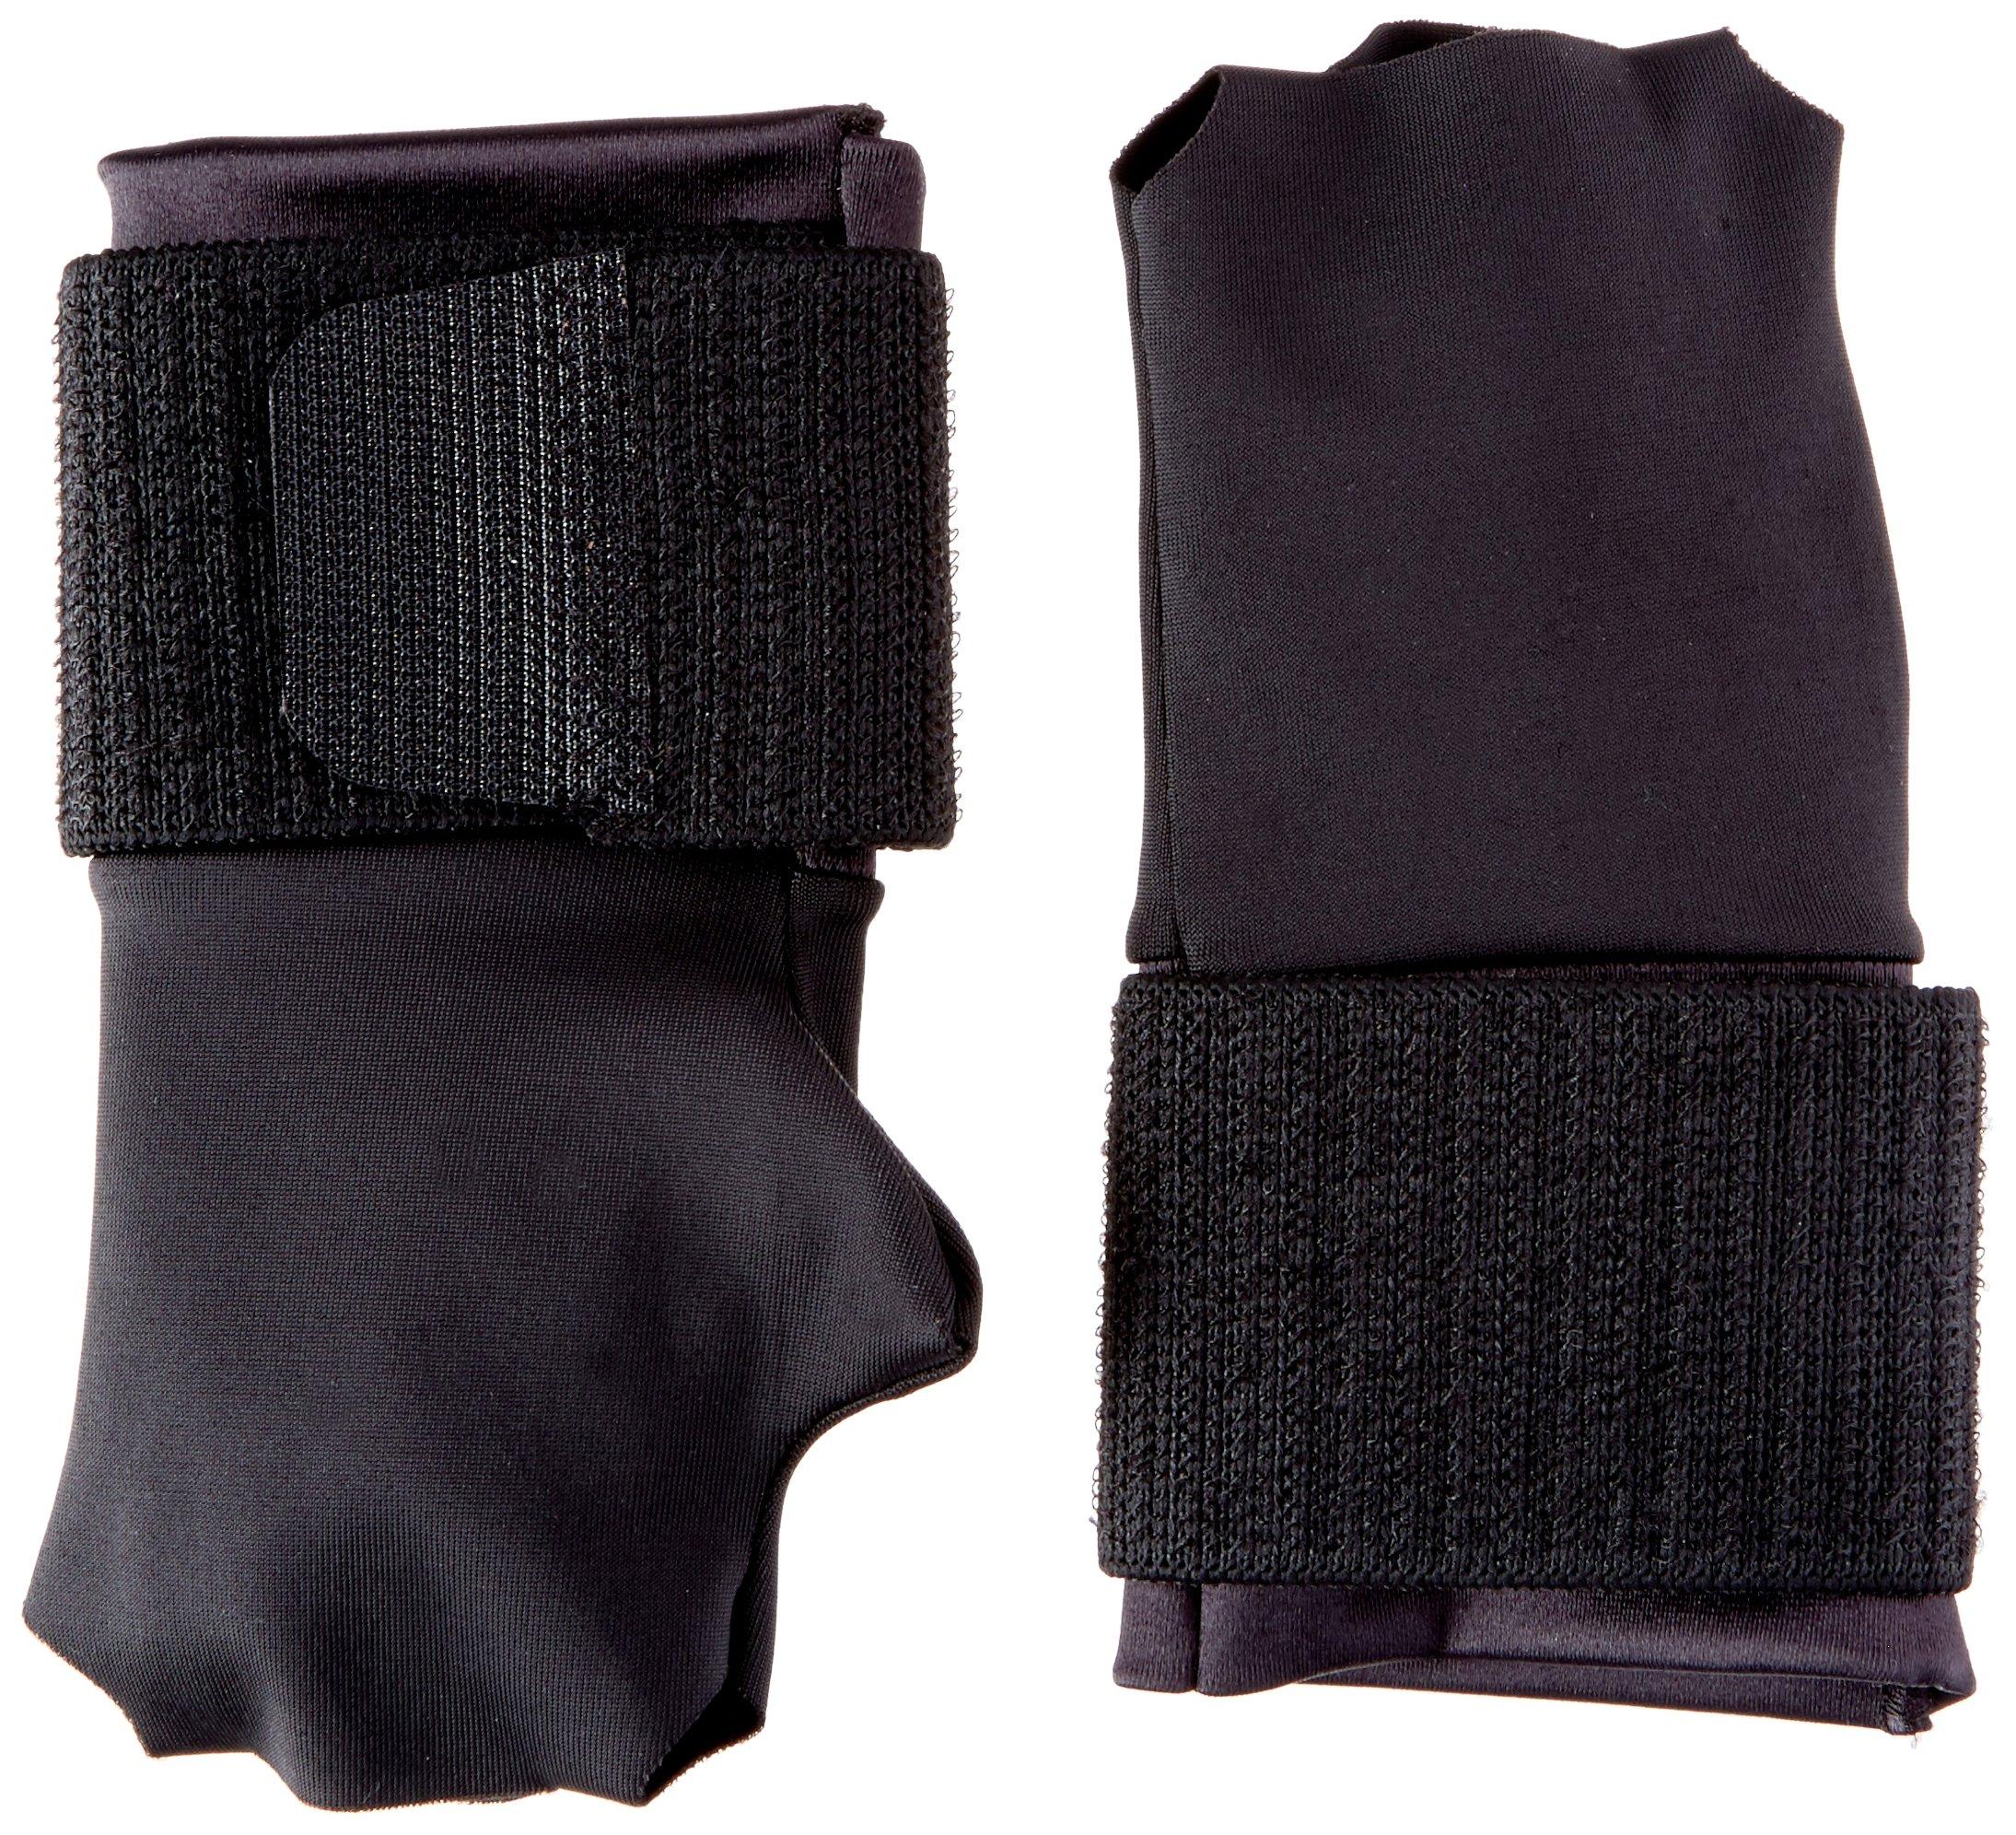 Dome Handeze Flex-Fit Therapeutic Gloves (DOM3733) by DomeSkin